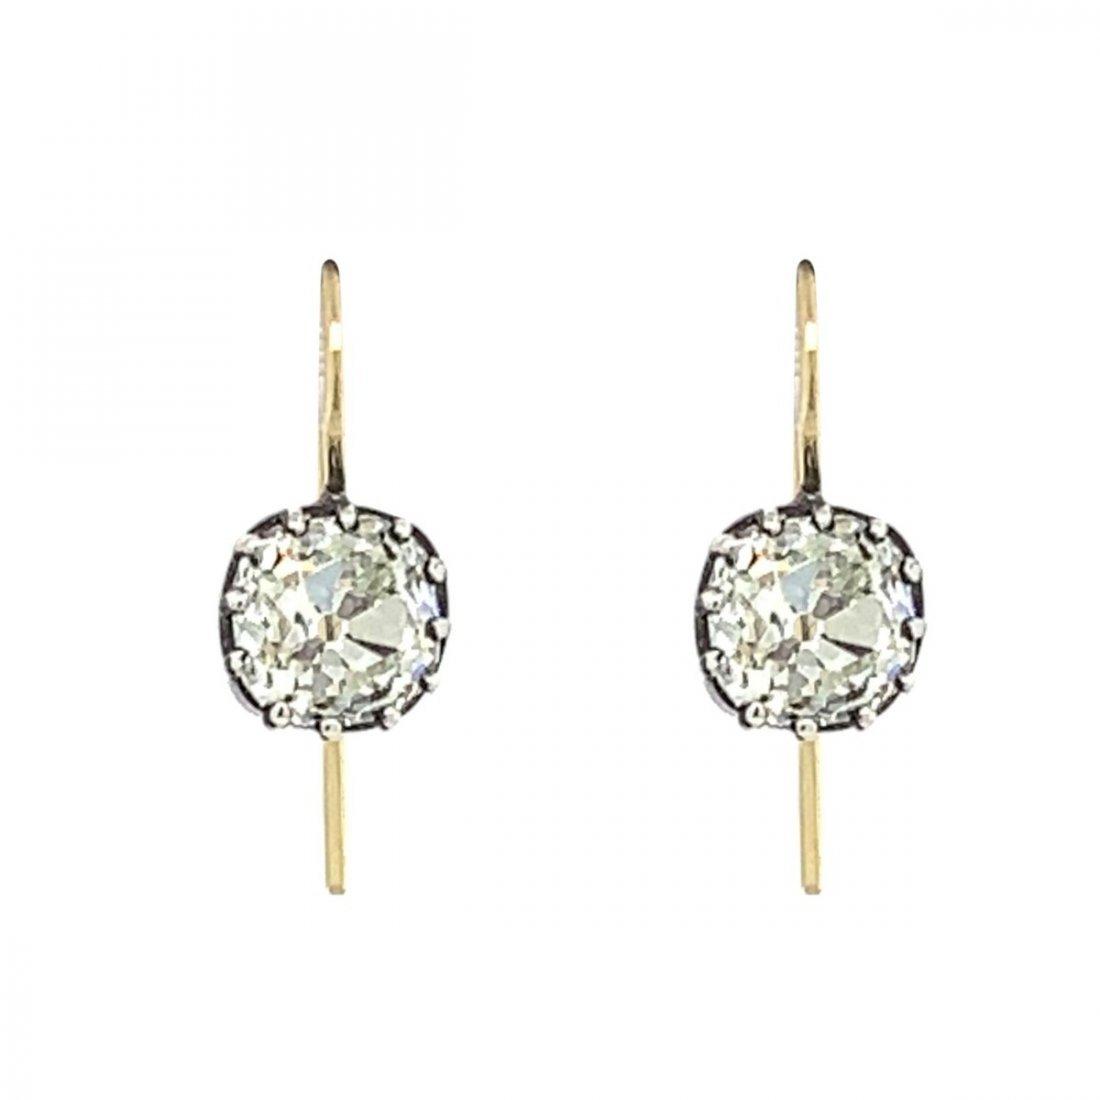 Antique Silver & Gold Old Mine Cut Diamond Earrings